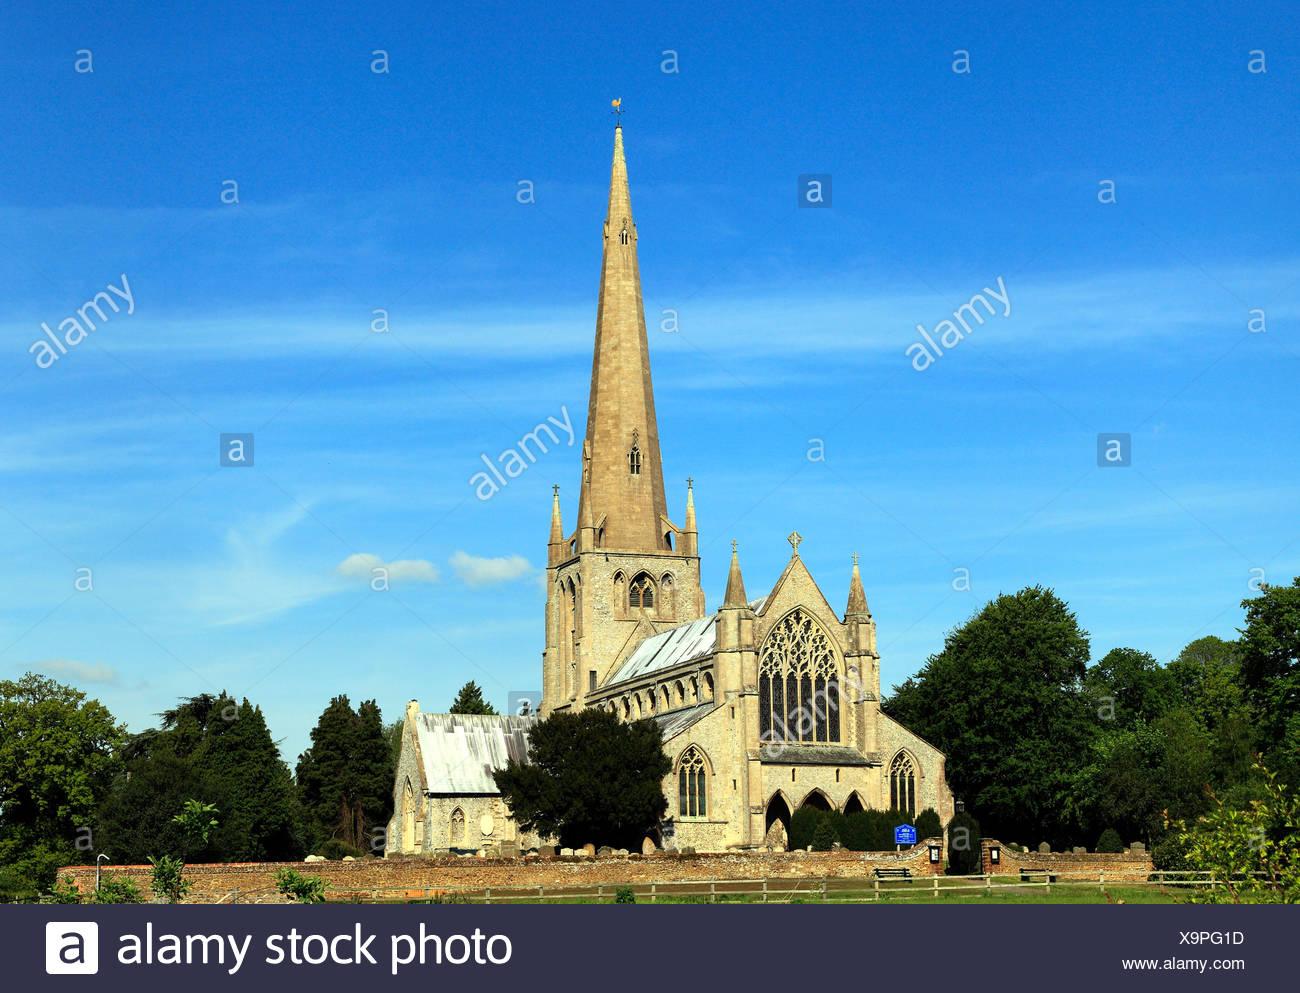 Snettisham, Norfolk, medieval church with spire, England, UK, English churches spires - Stock Image